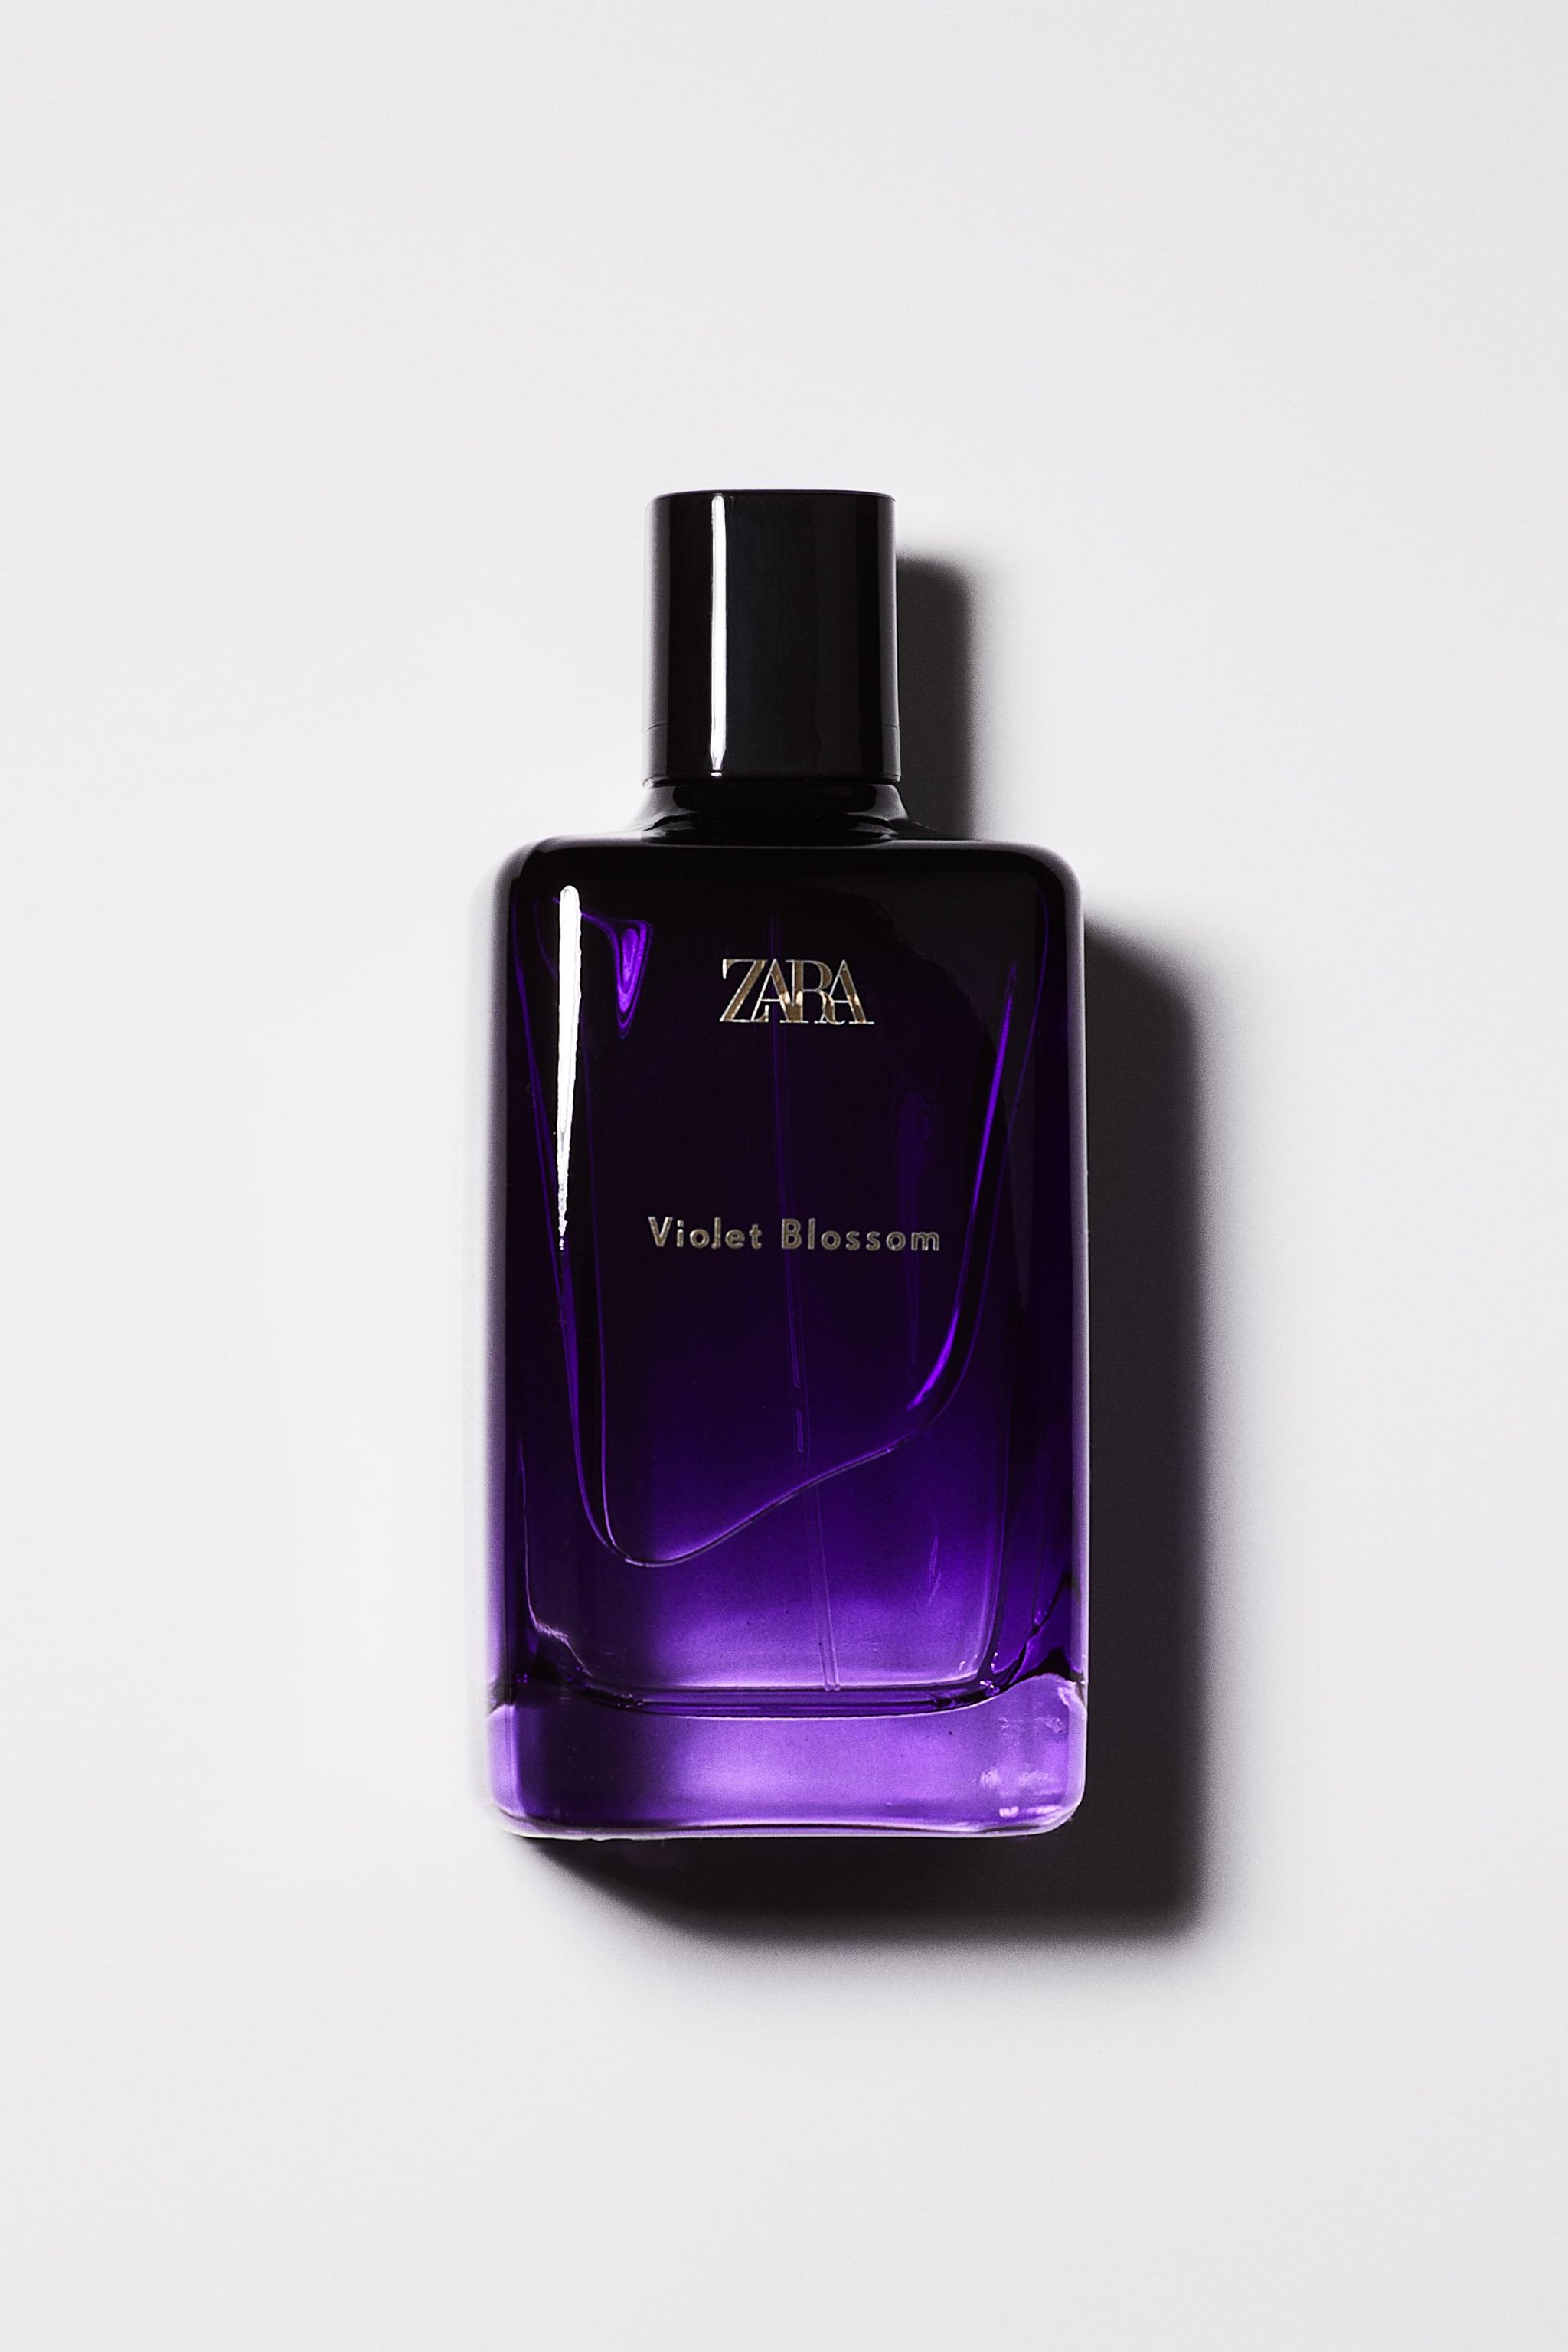 Zara VIOLET BLOSSOM 200 ML